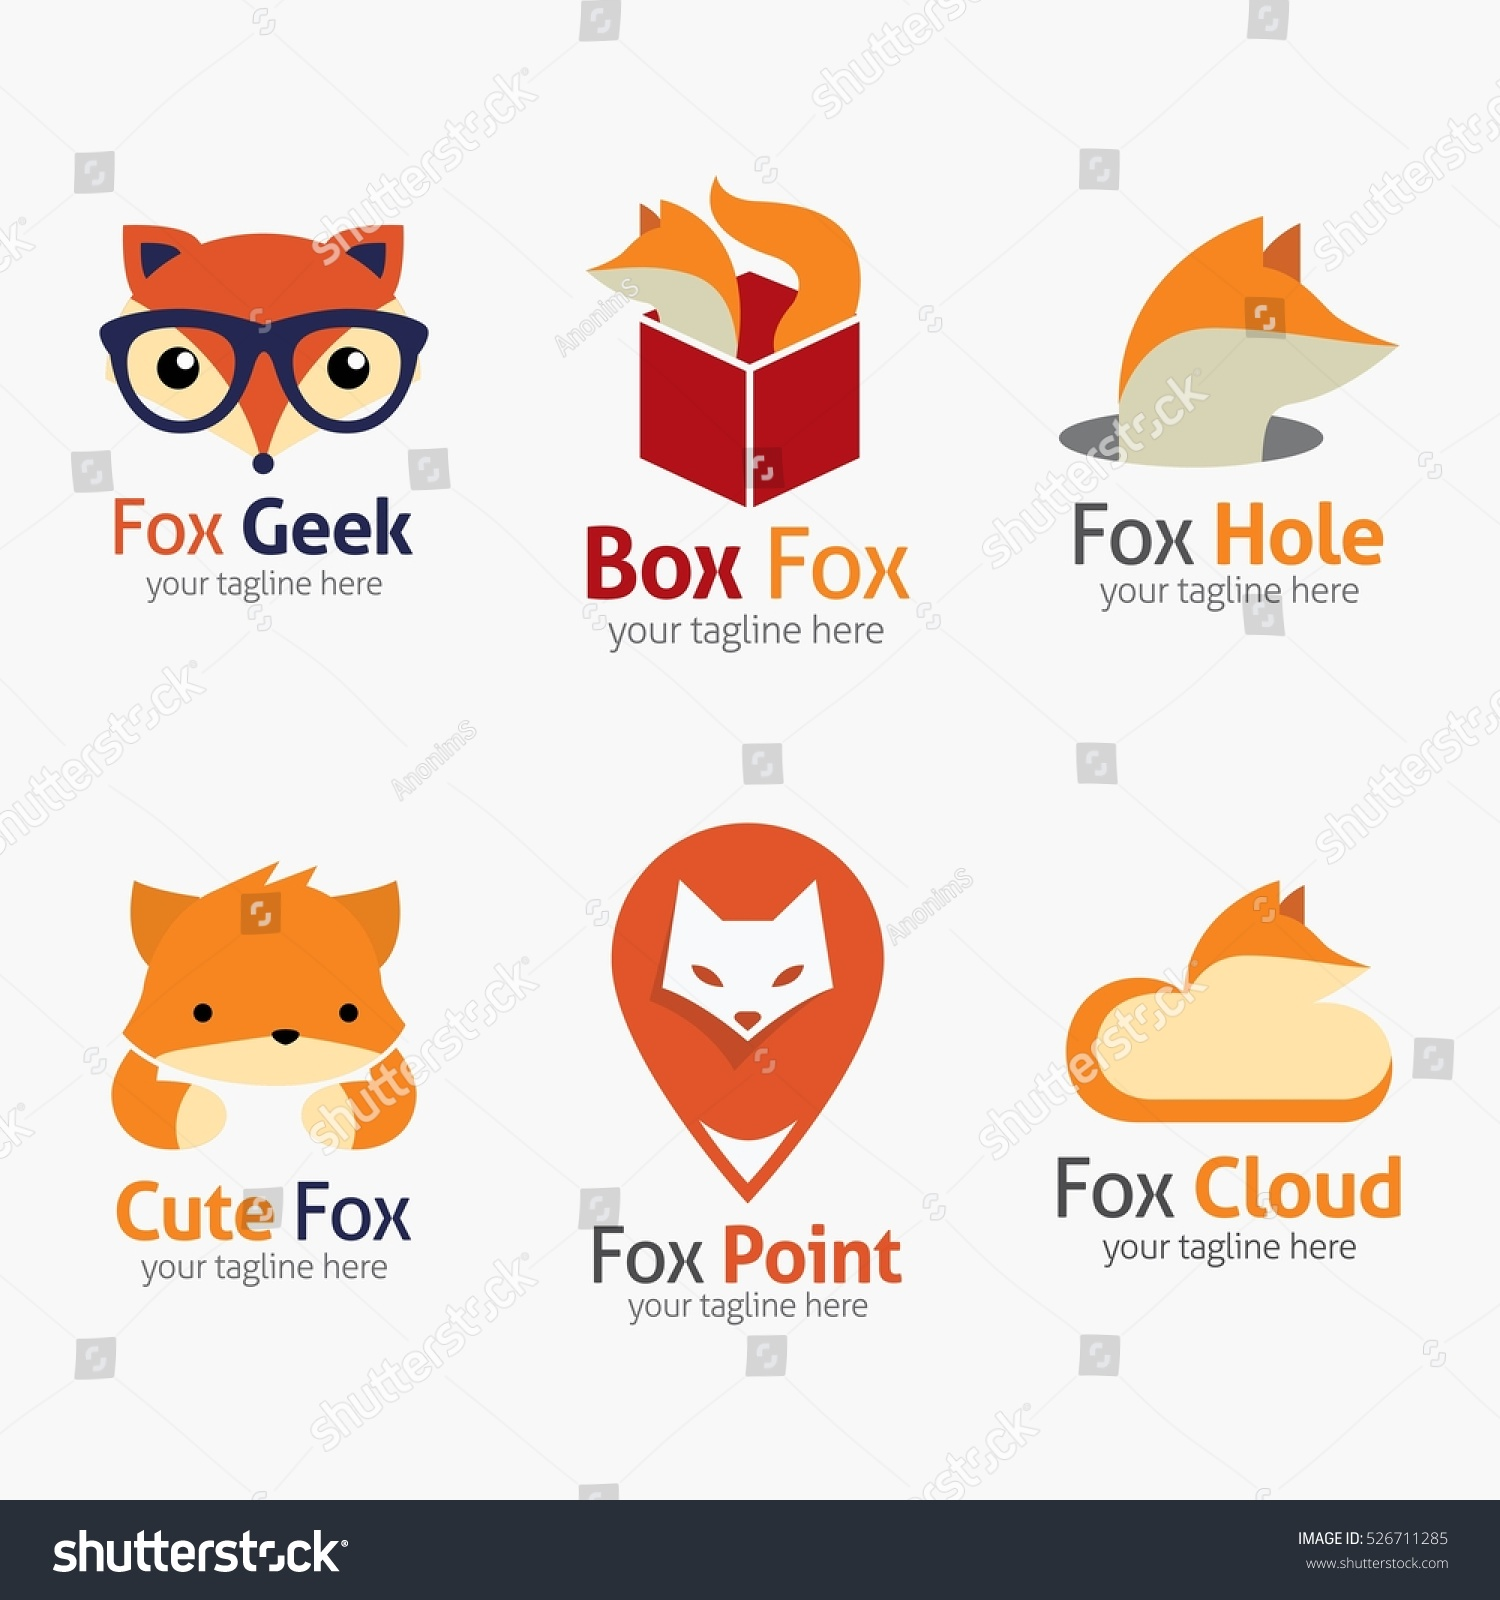 design templates vectors vector artwork wwwresume formatcom stock vector fox logo design template vector illustration 526711285 - Wwwresume Formatcom